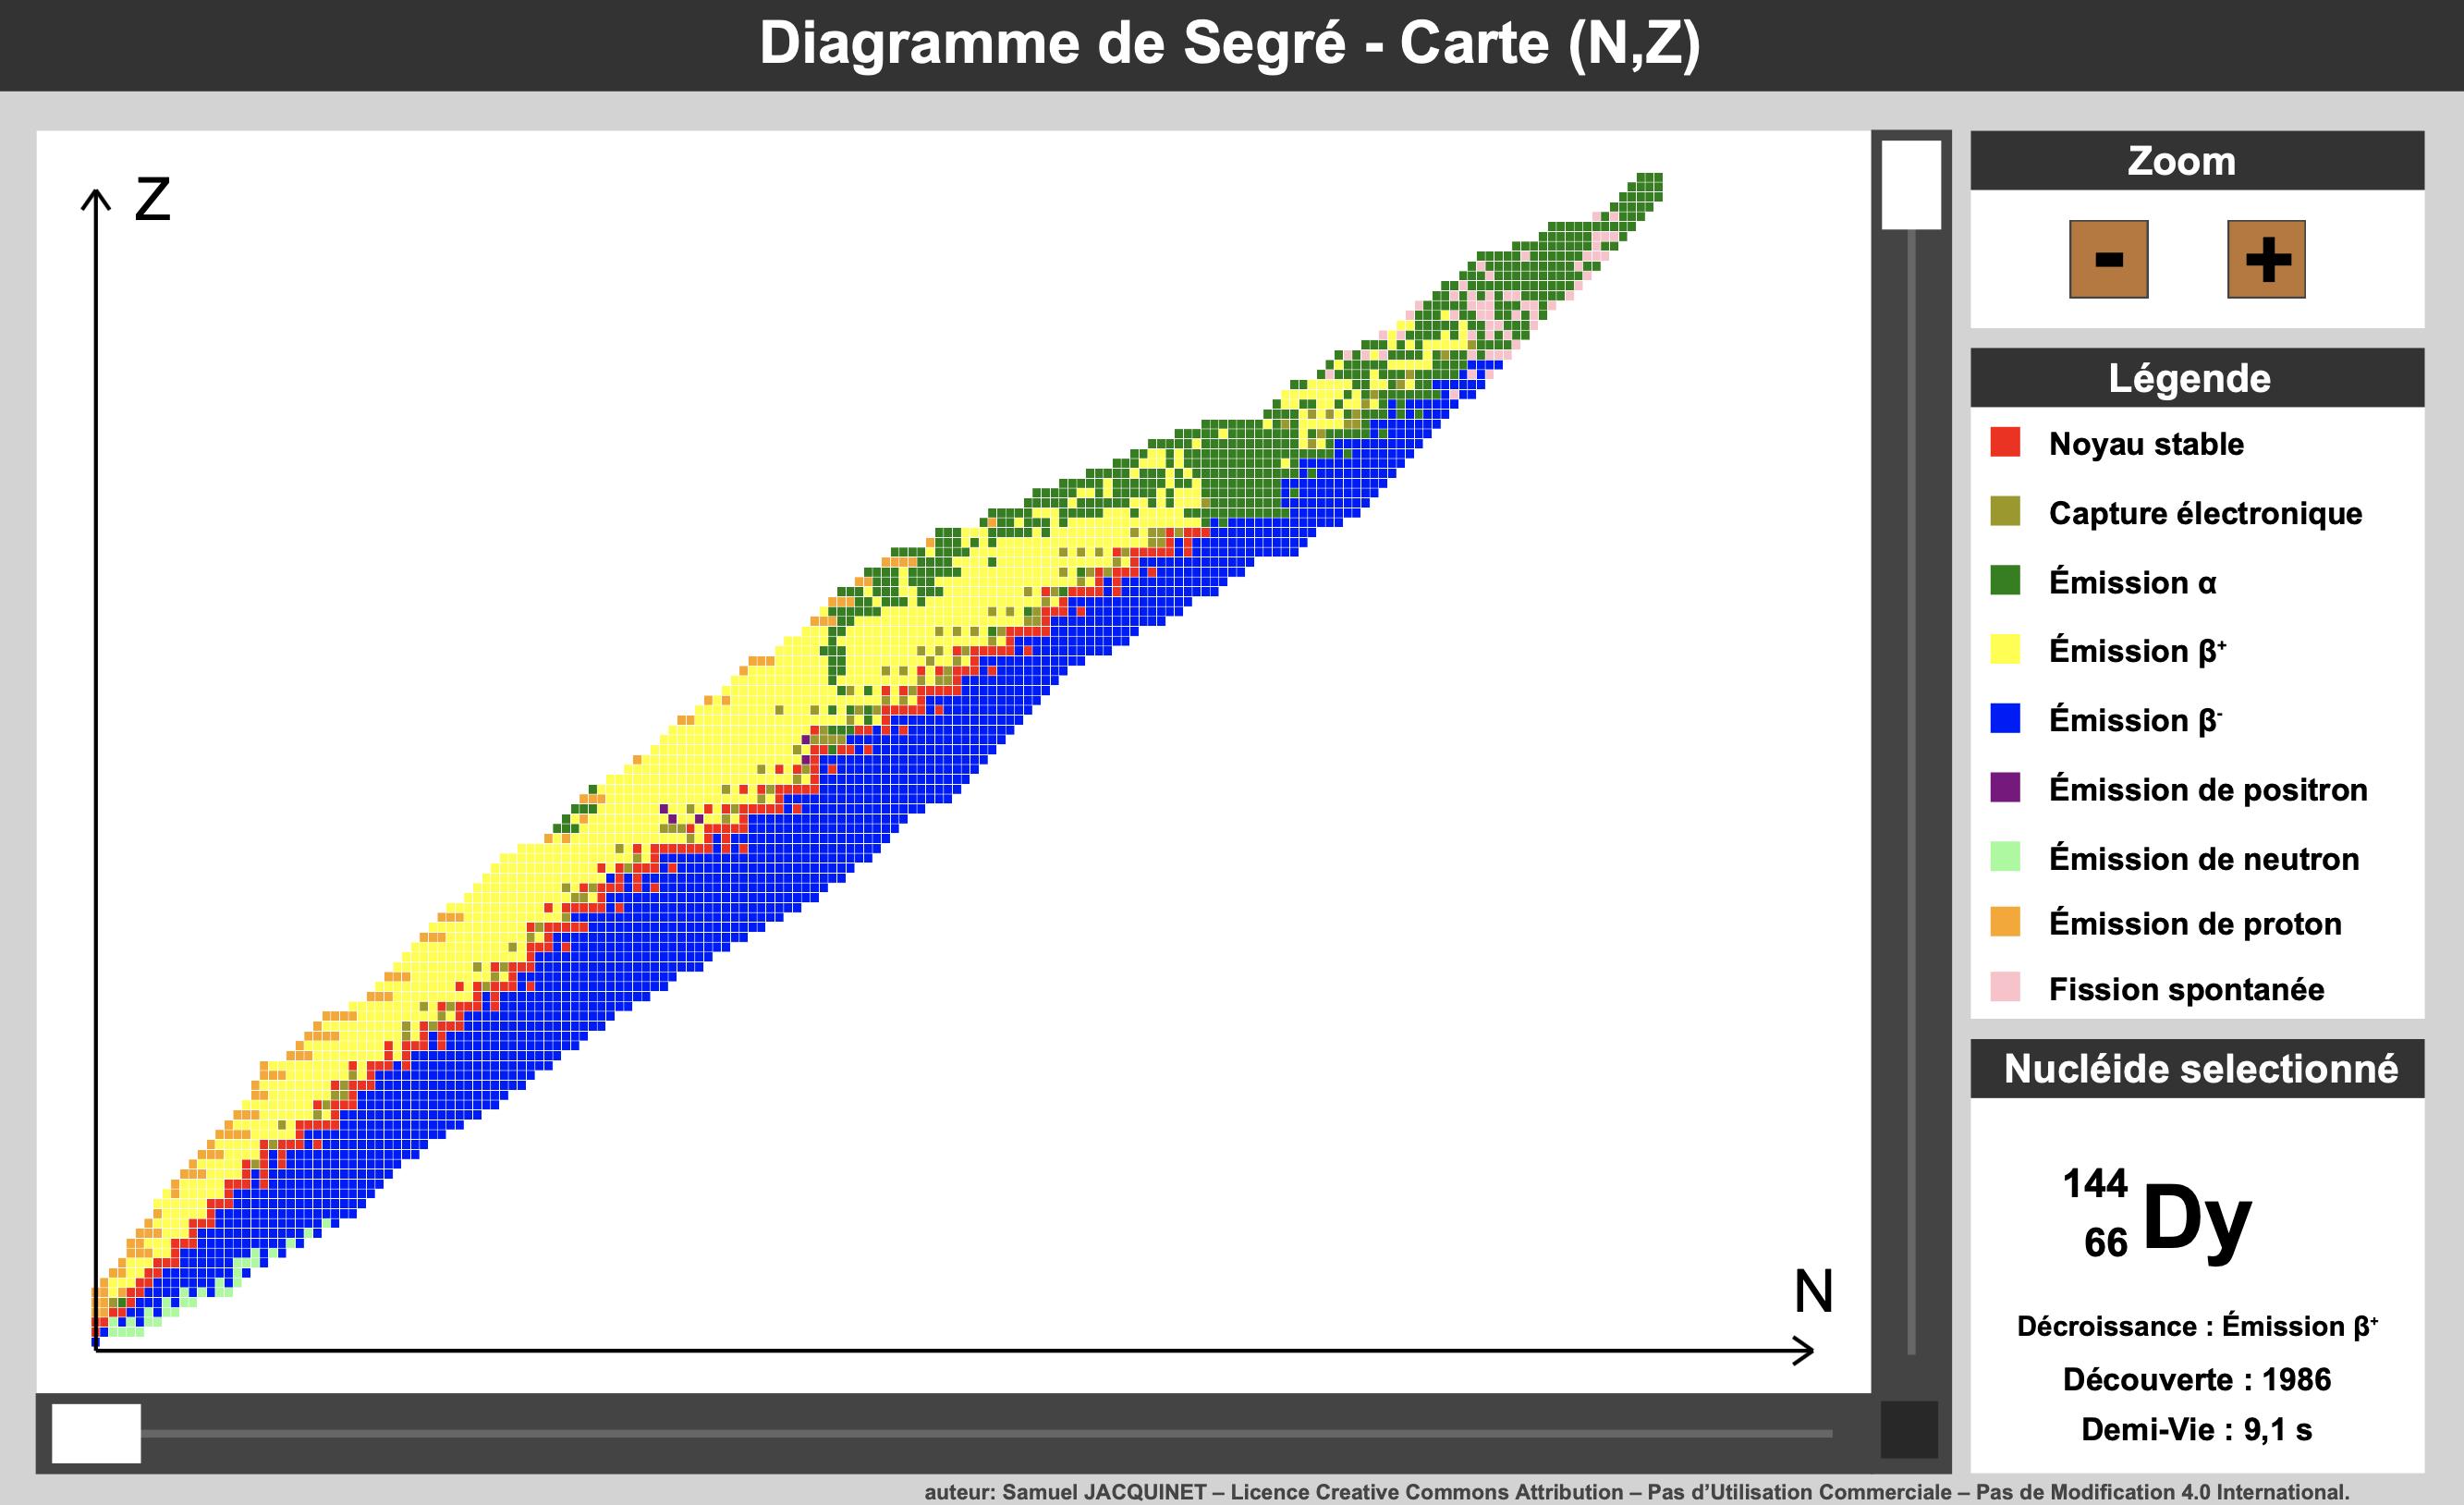 Diagramme de Segré - carte (N,Z)